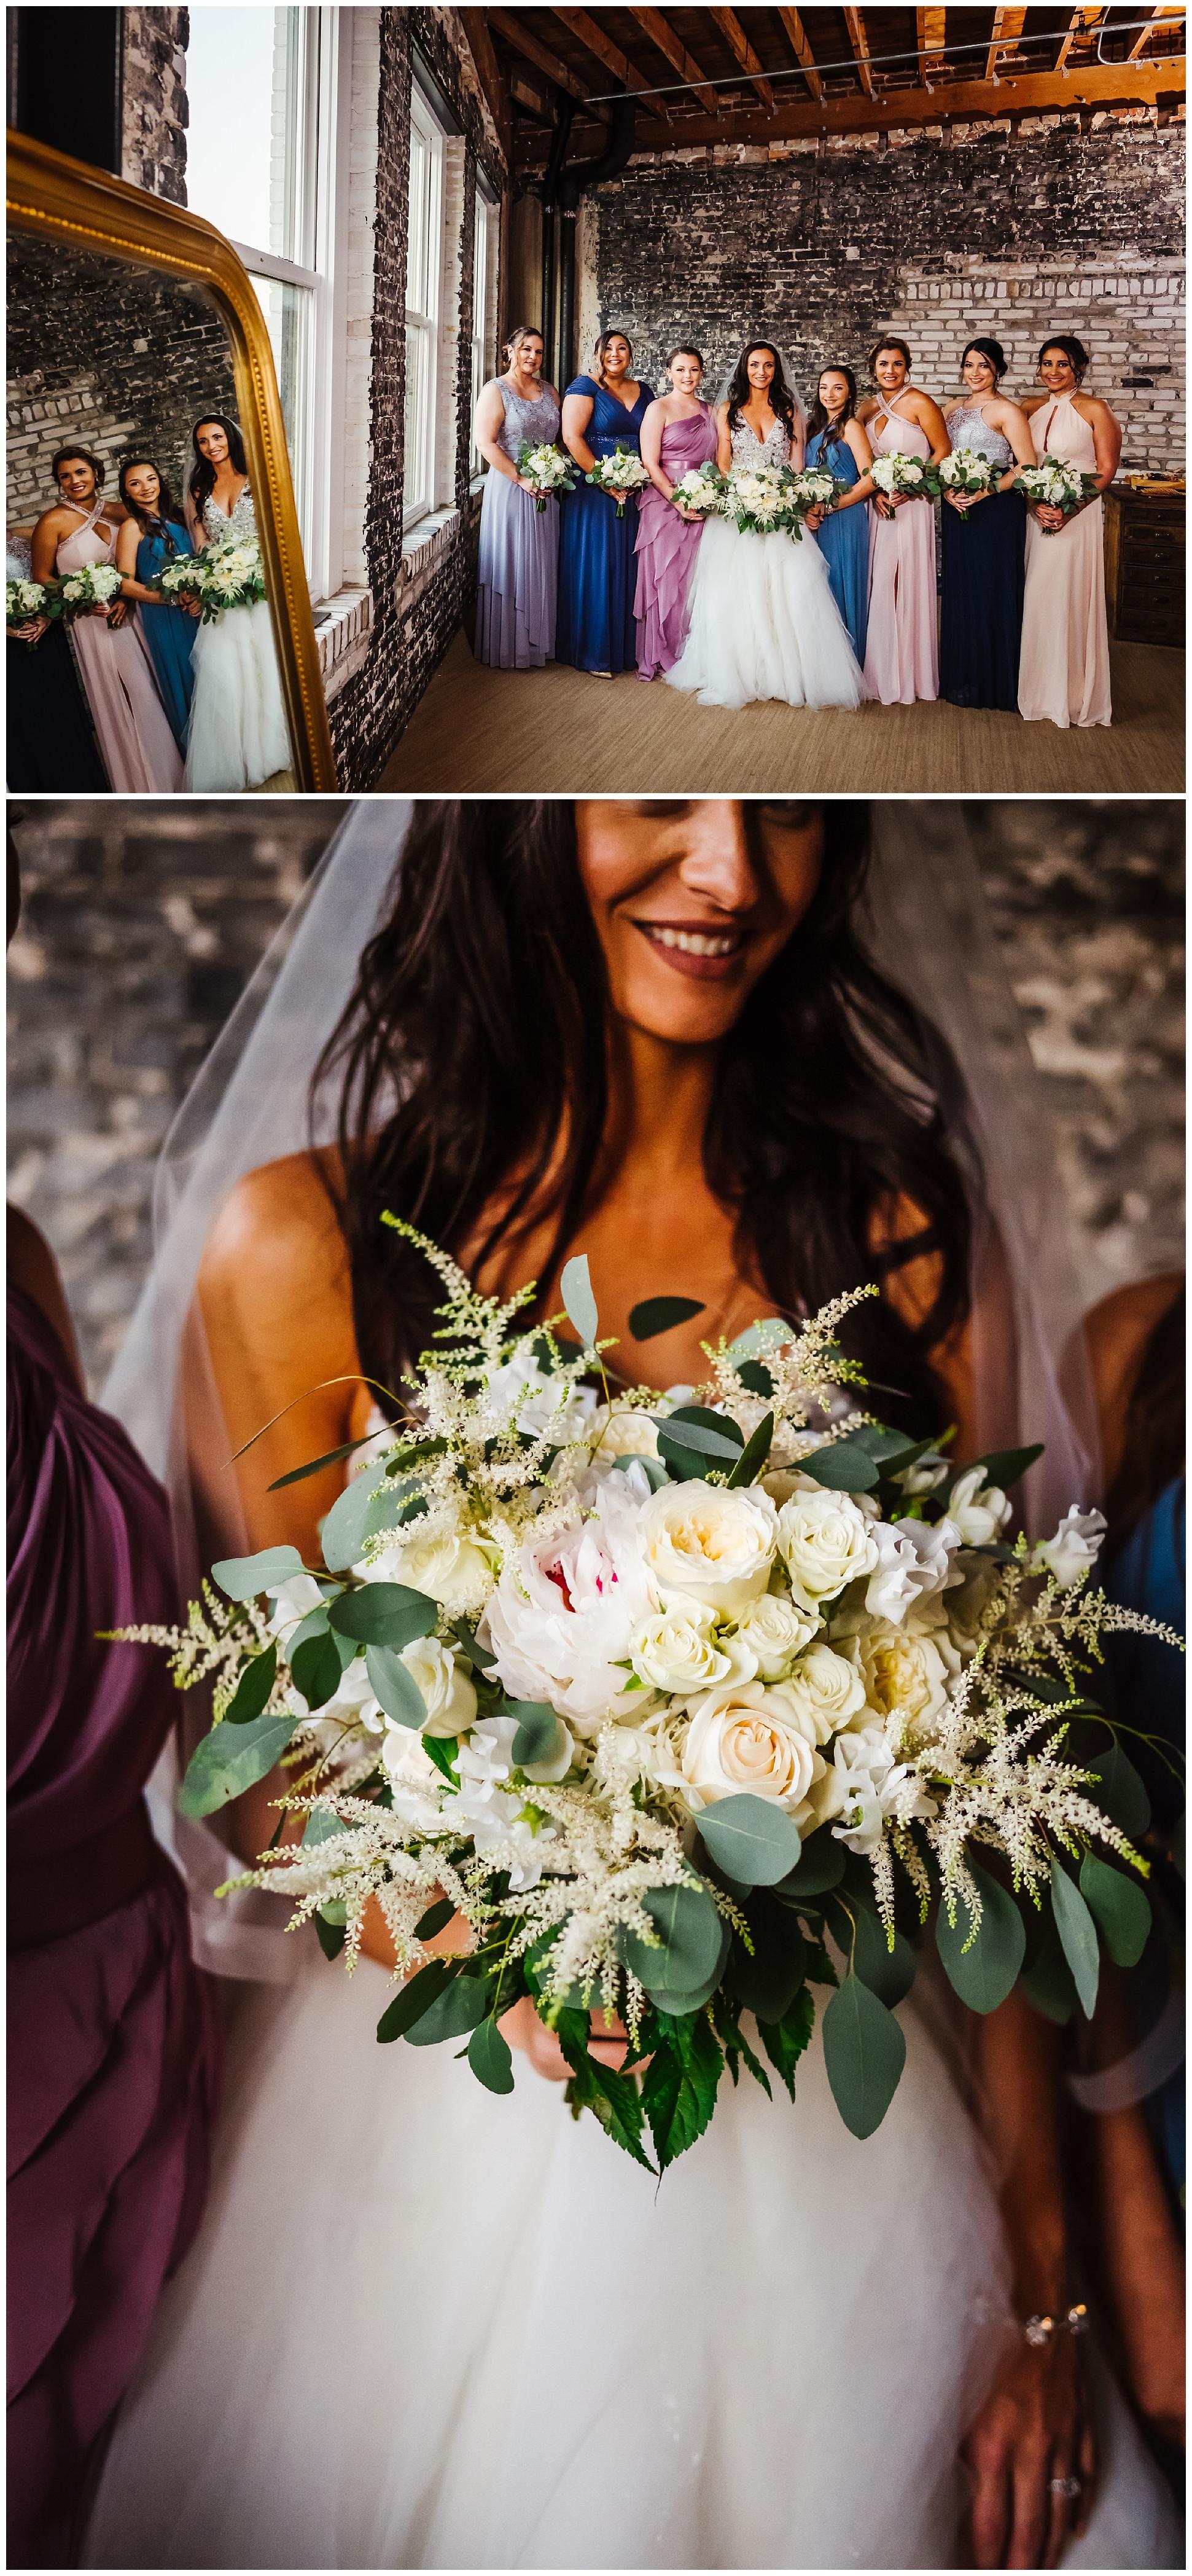 tampa-wedding-photographer-oxford-exchange-garland-candlelight-gold-hayley-paige_0035.jpg